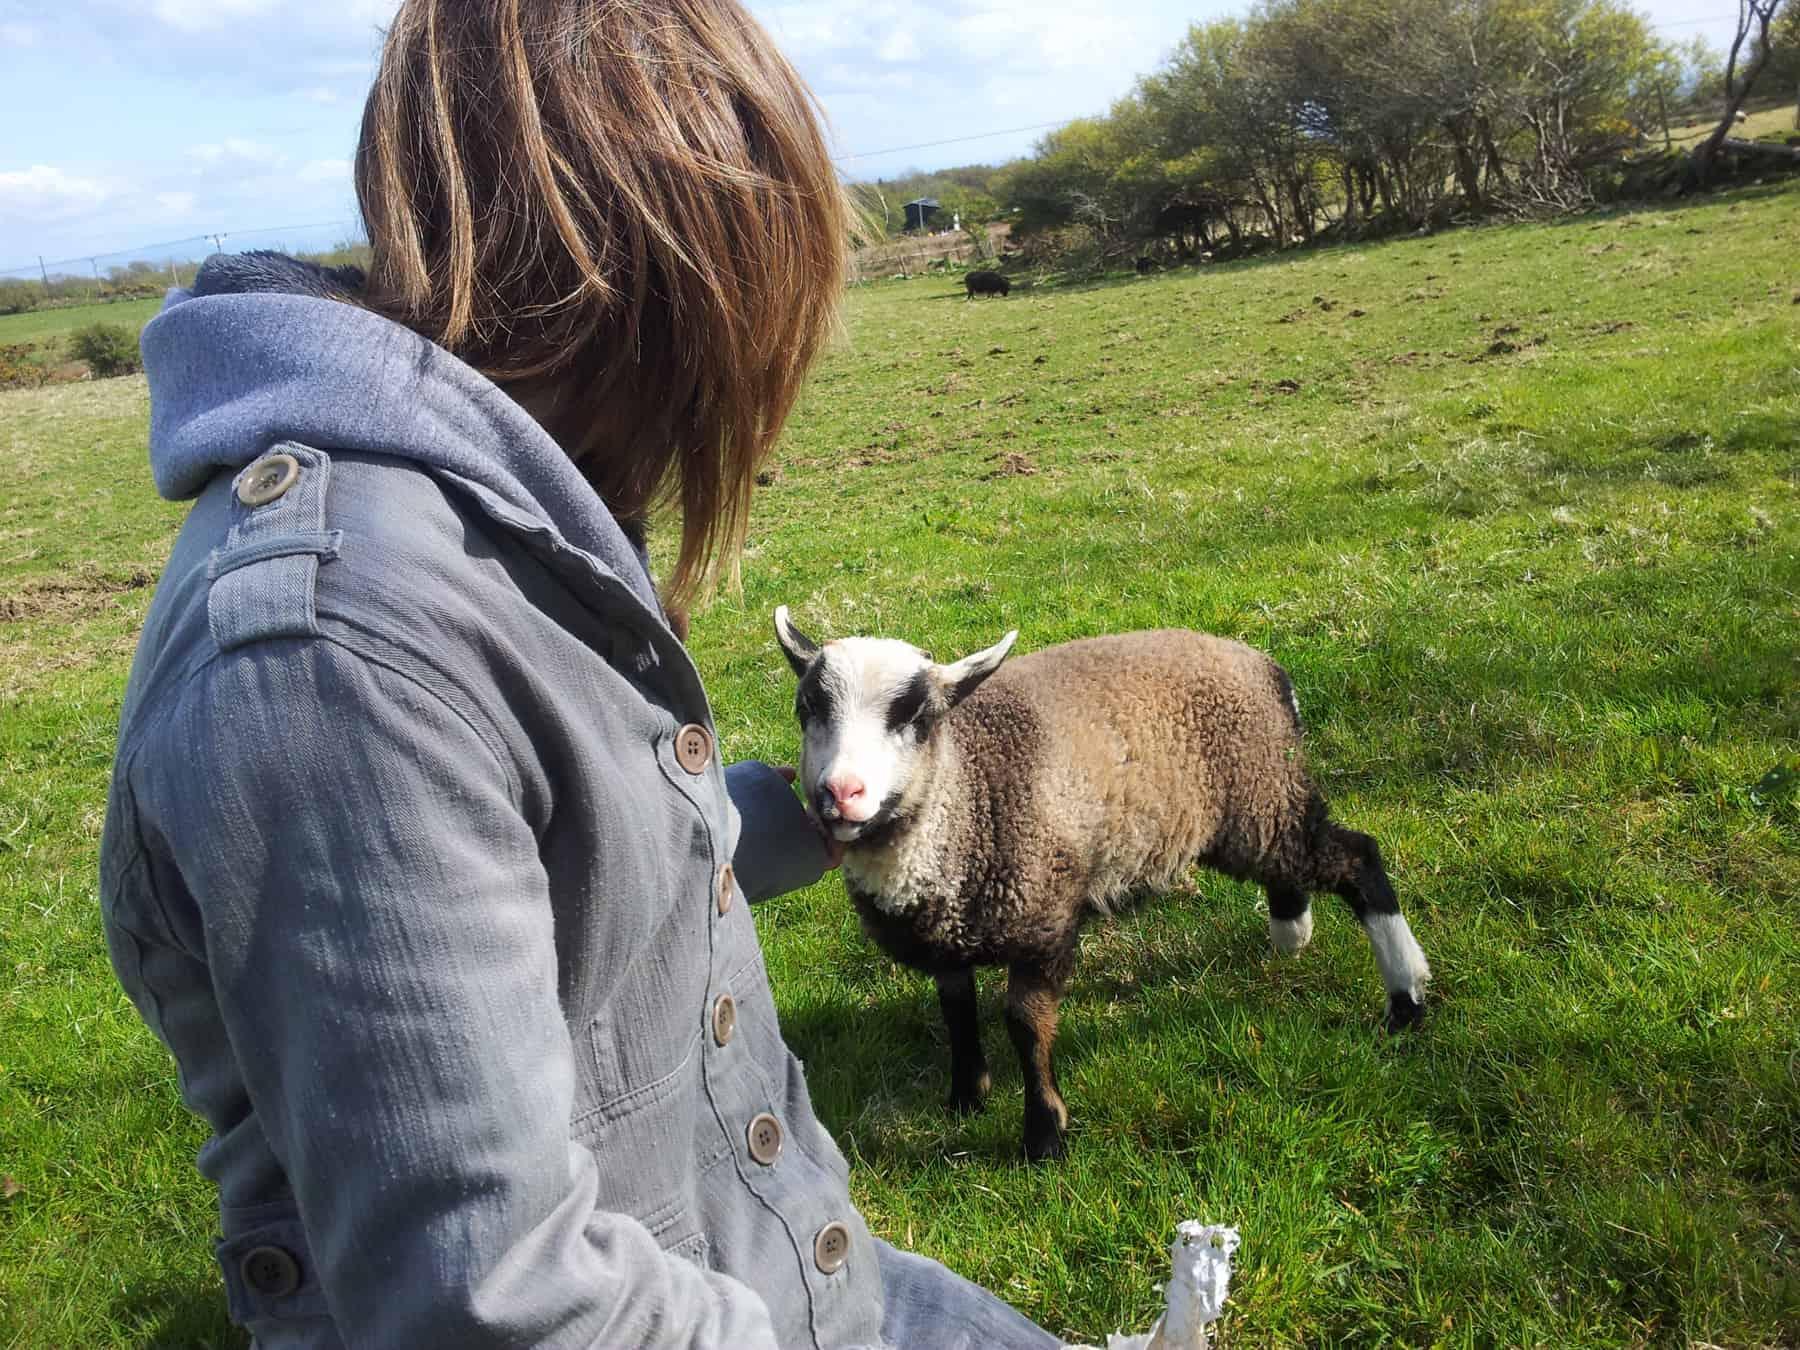 Poppy katmoget badgerface shetland cross jacob sheep lamb cute cuddles